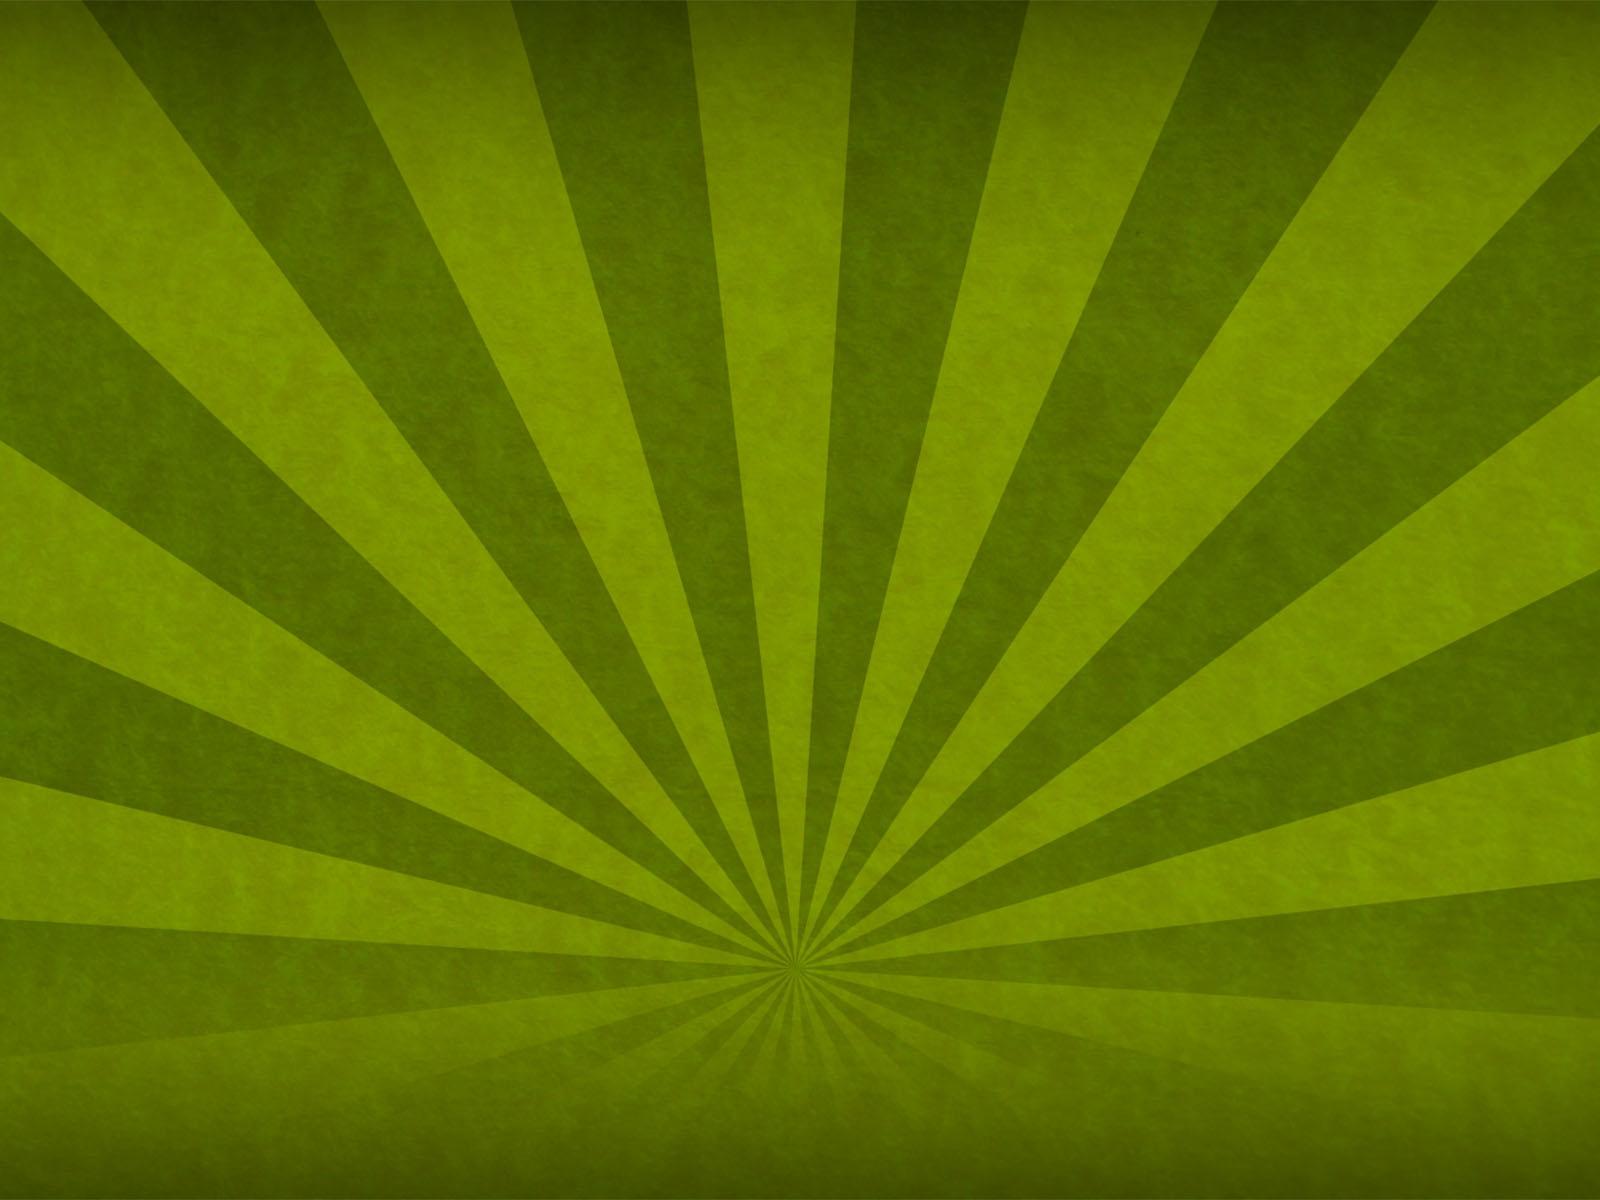 Green Sunbeam Backgrounds Abstract Green Templates